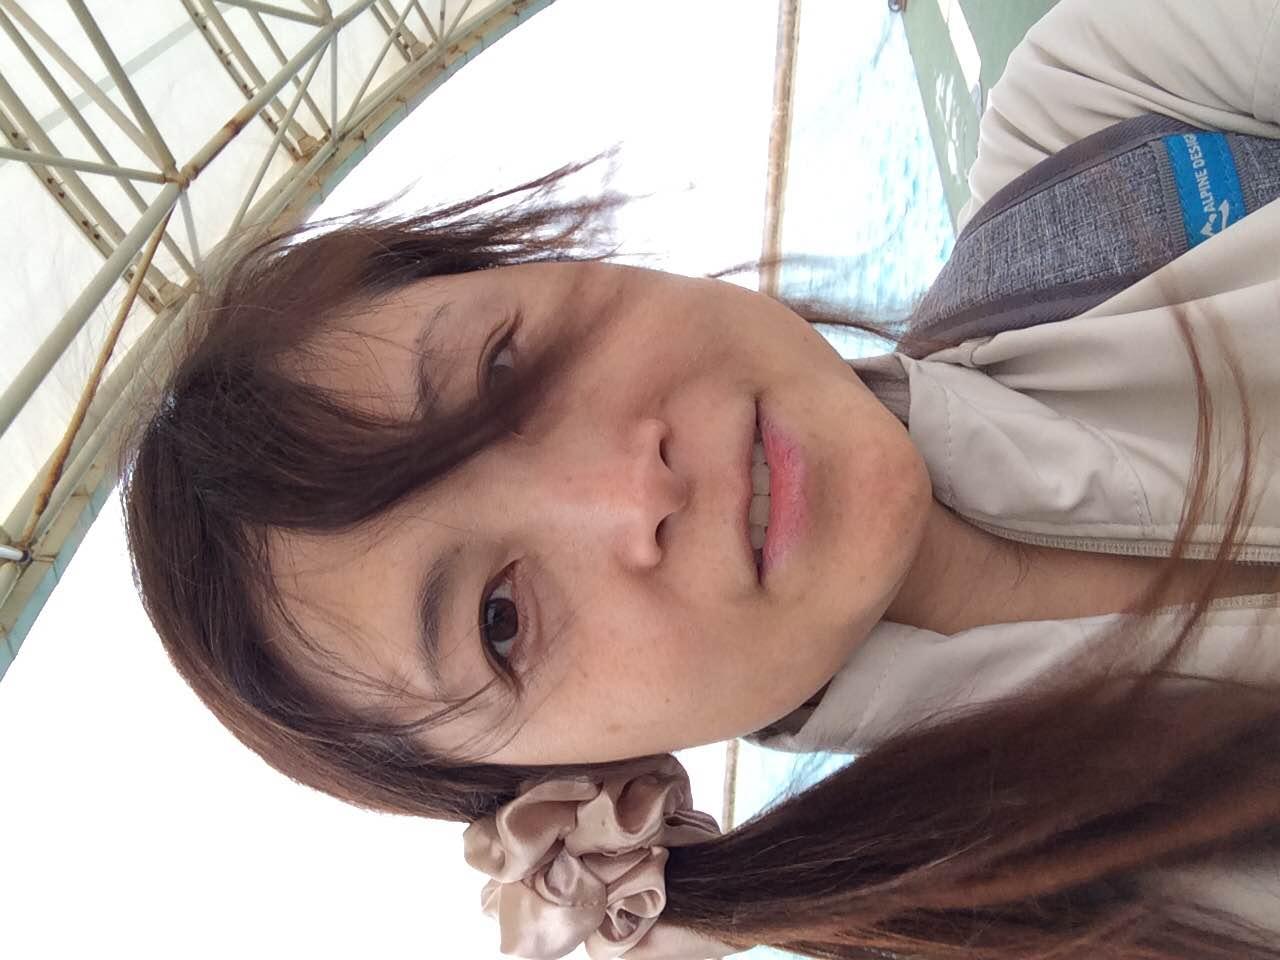 1/2015020916491103-IMG_2675-small.jpg